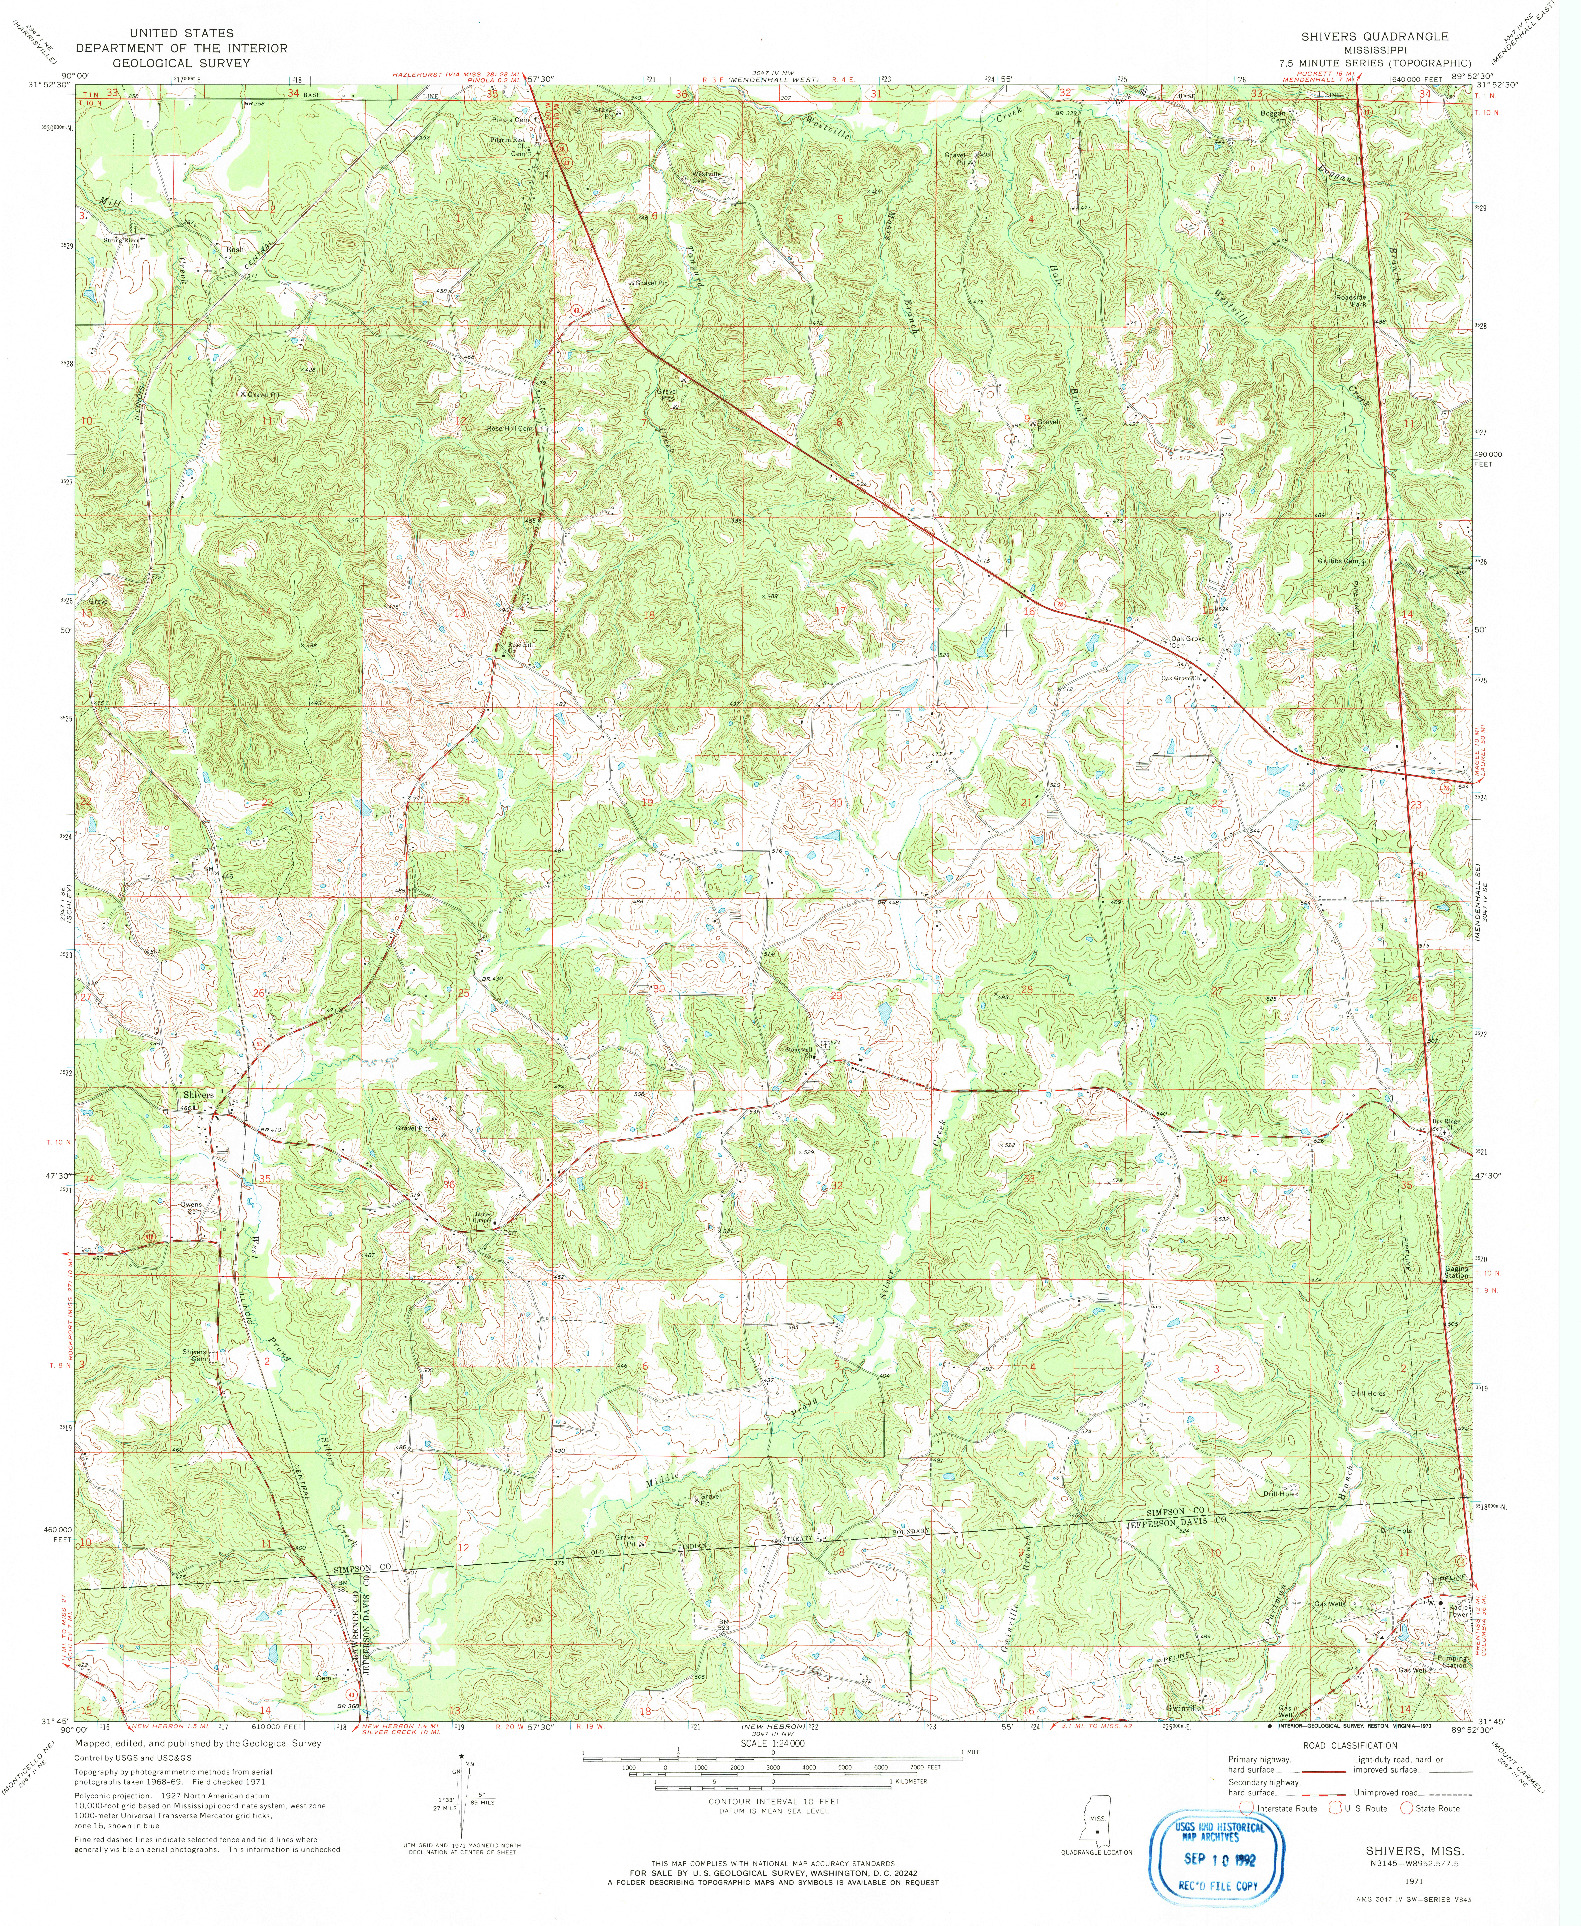 USGS 1:24000-SCALE QUADRANGLE FOR SHIVERS, MS 1971